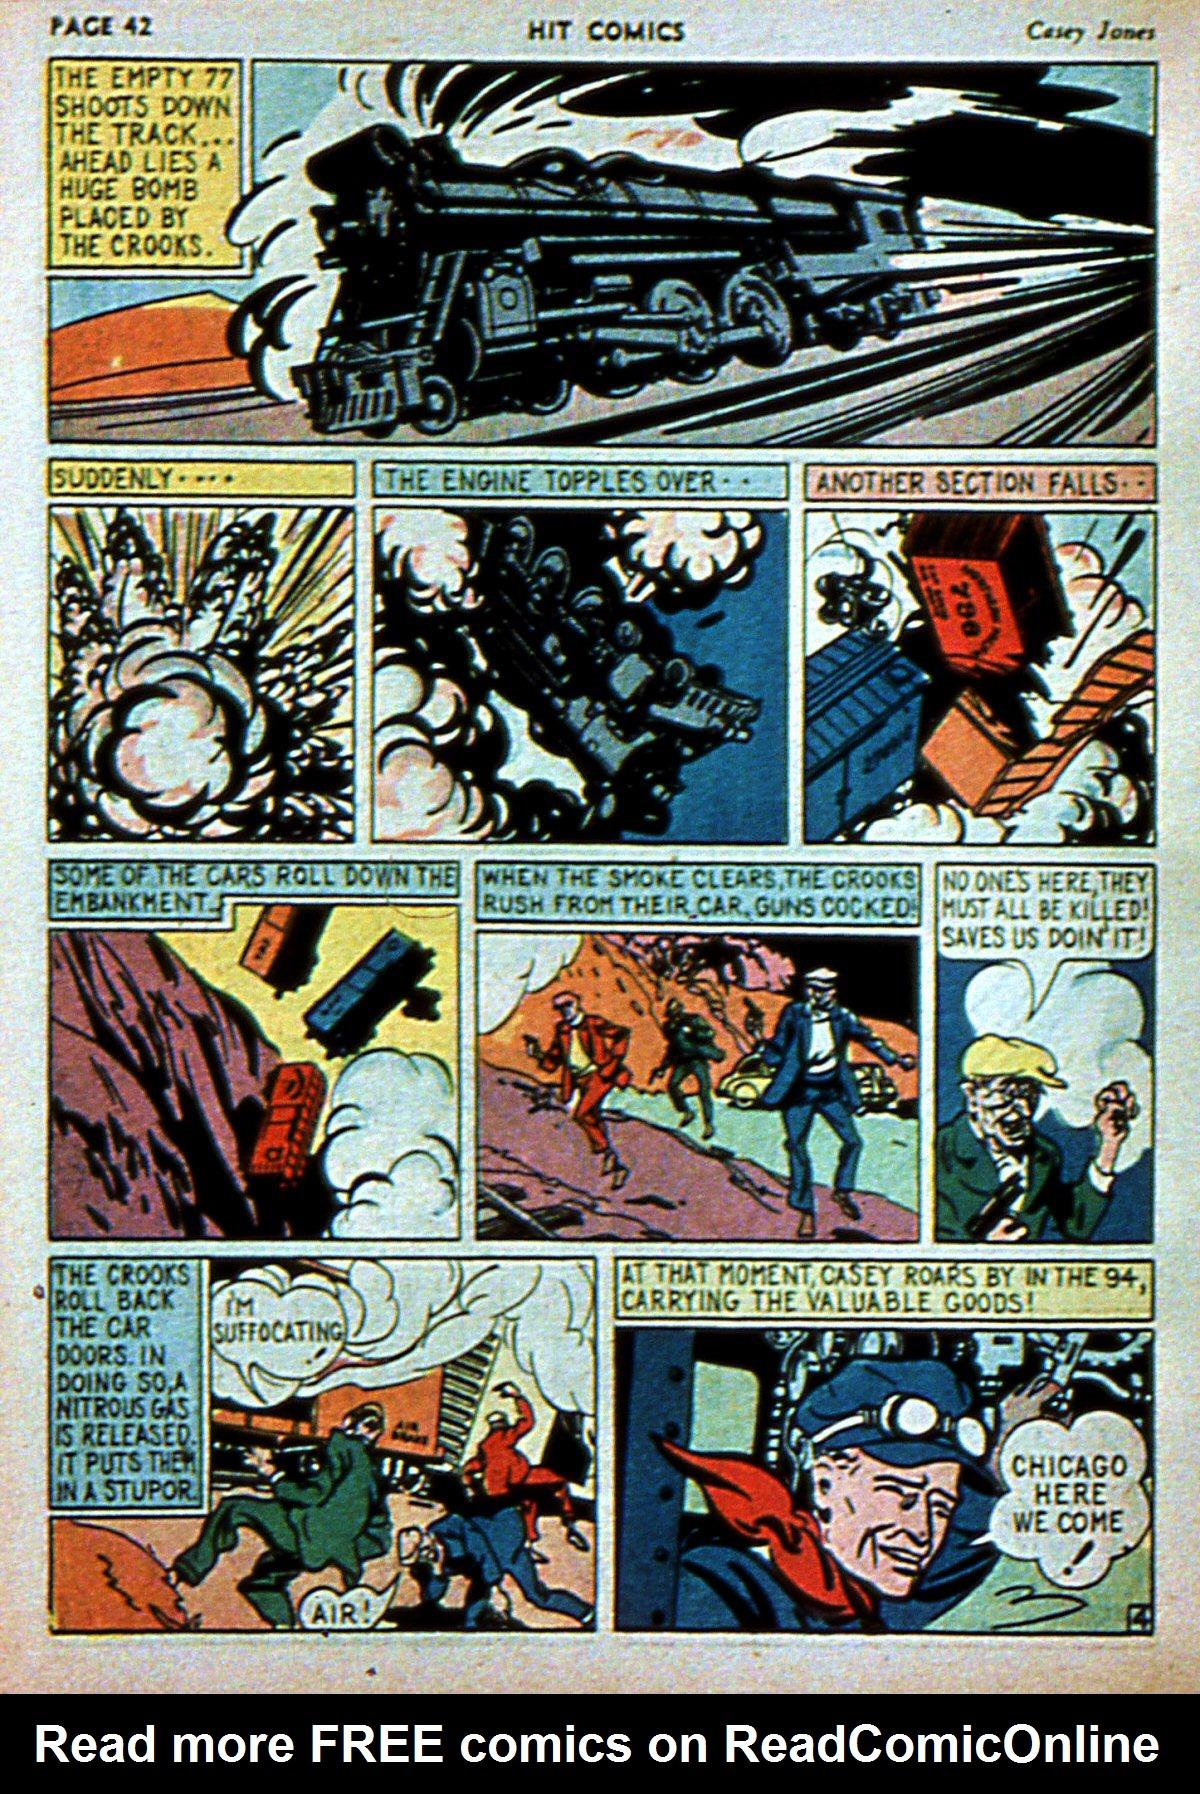 Read online Hit Comics comic -  Issue #3 - 44